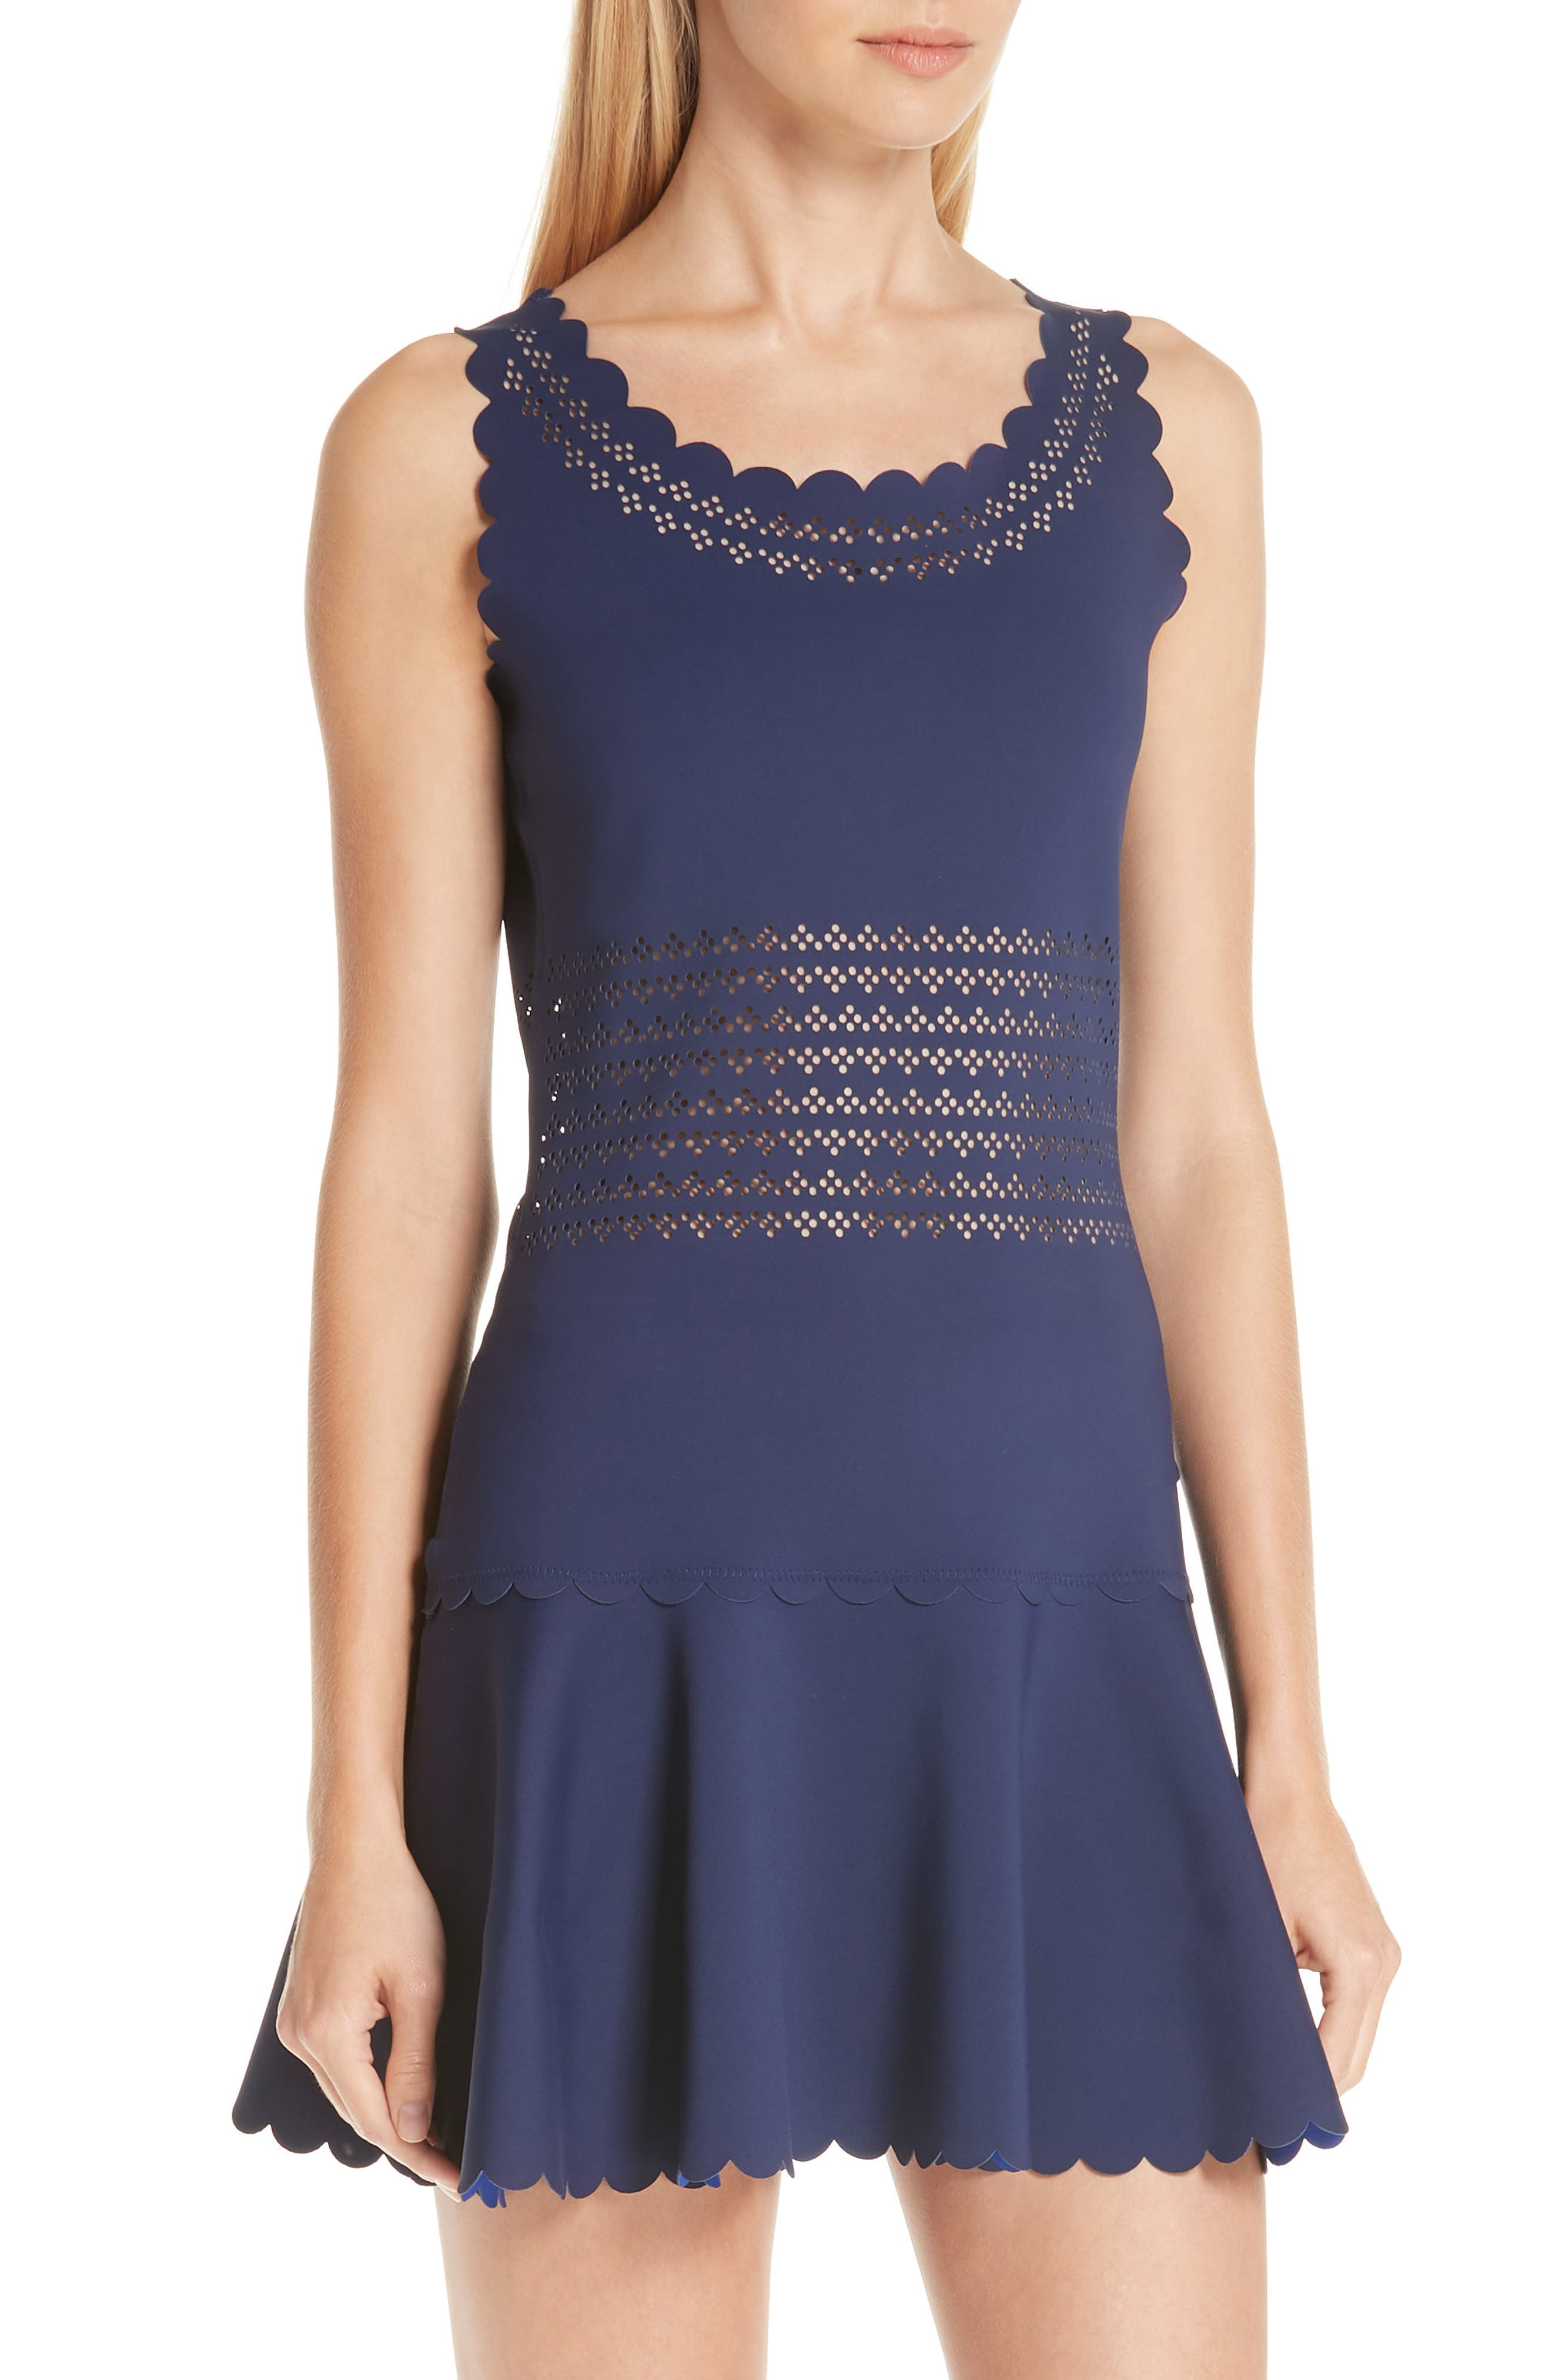 Center Court Tennis Dress,                             Alternate thumbnail 3, color,                             BLUE